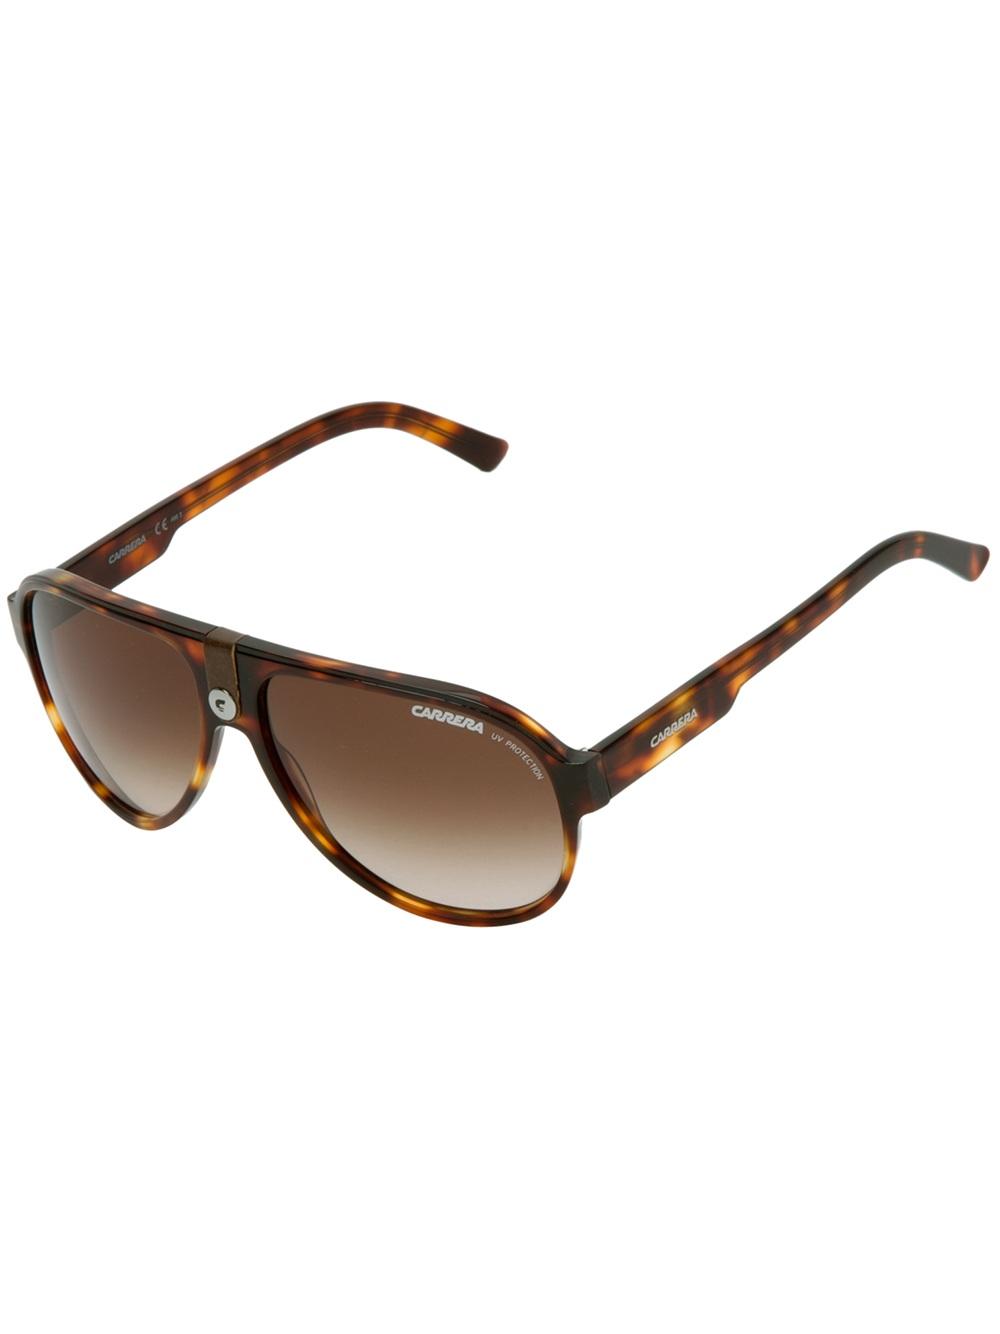 15828c8b2187 Carrera Tortoise Shell Sunglasses in Brown for Men - Lyst